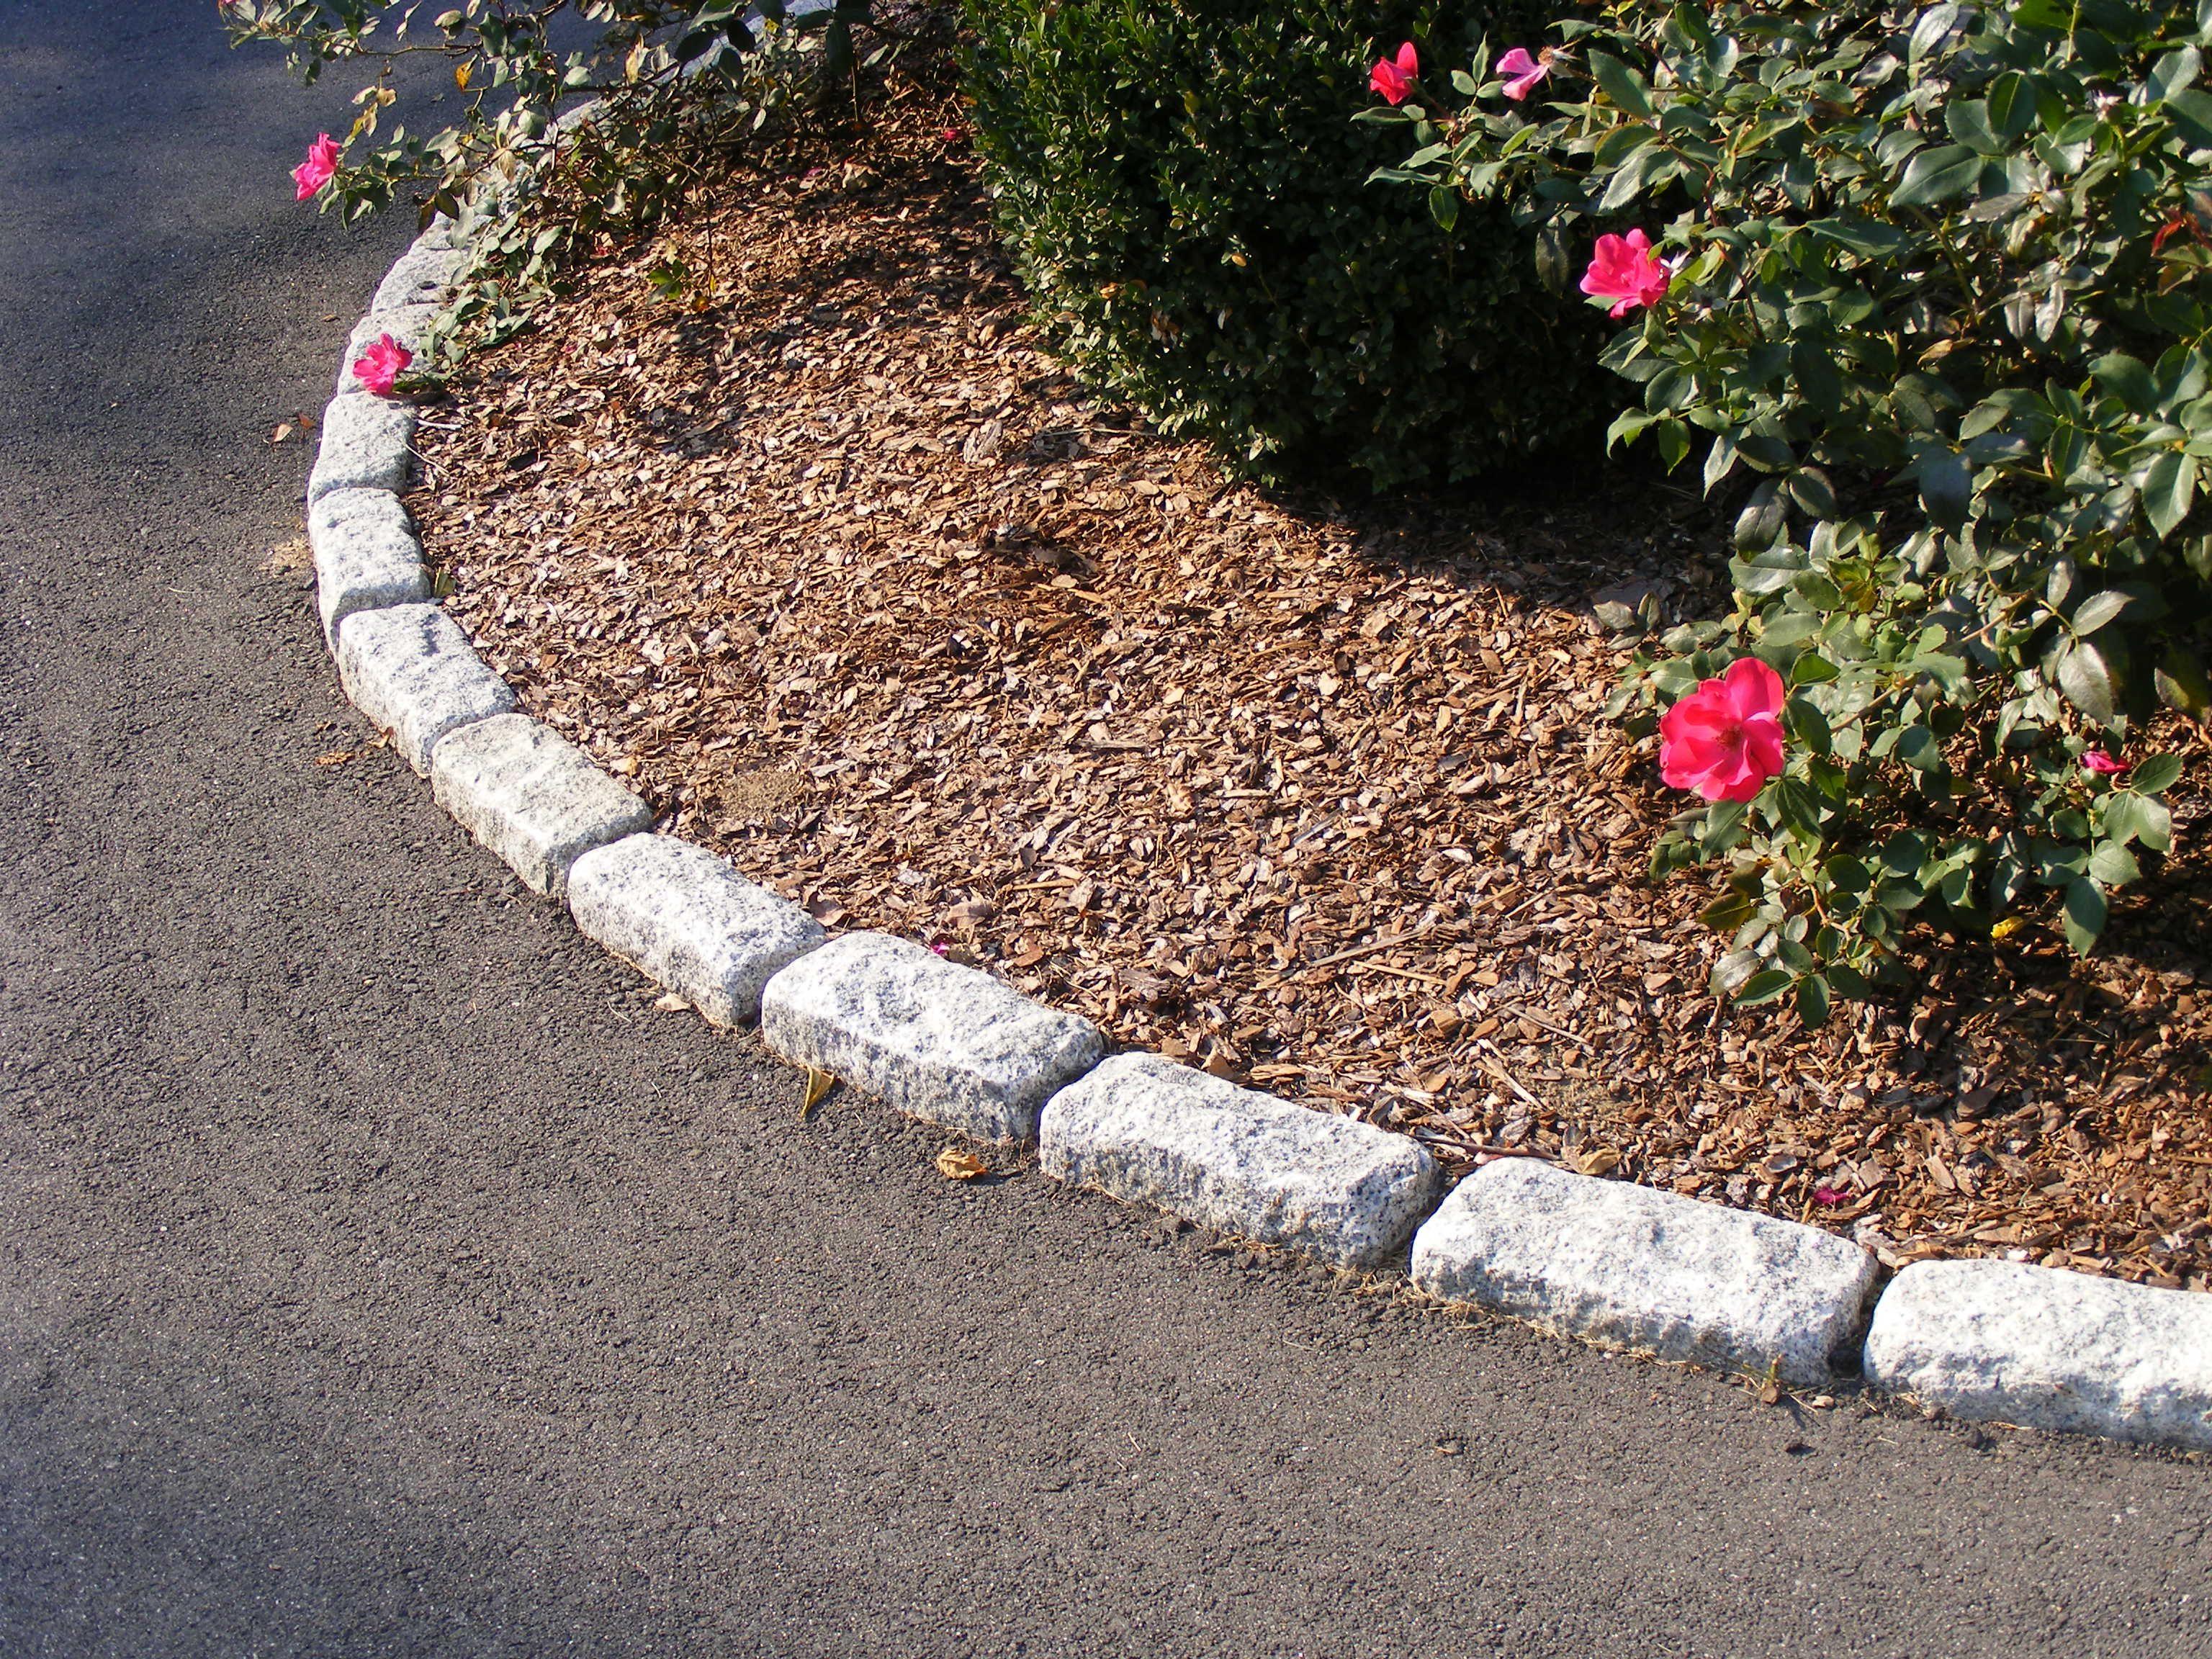 Driveway Edging Standard Cobblestones Used As Walkway And Planter Bed Edging Driveway Edging Garden Edging Stones Stone Edging